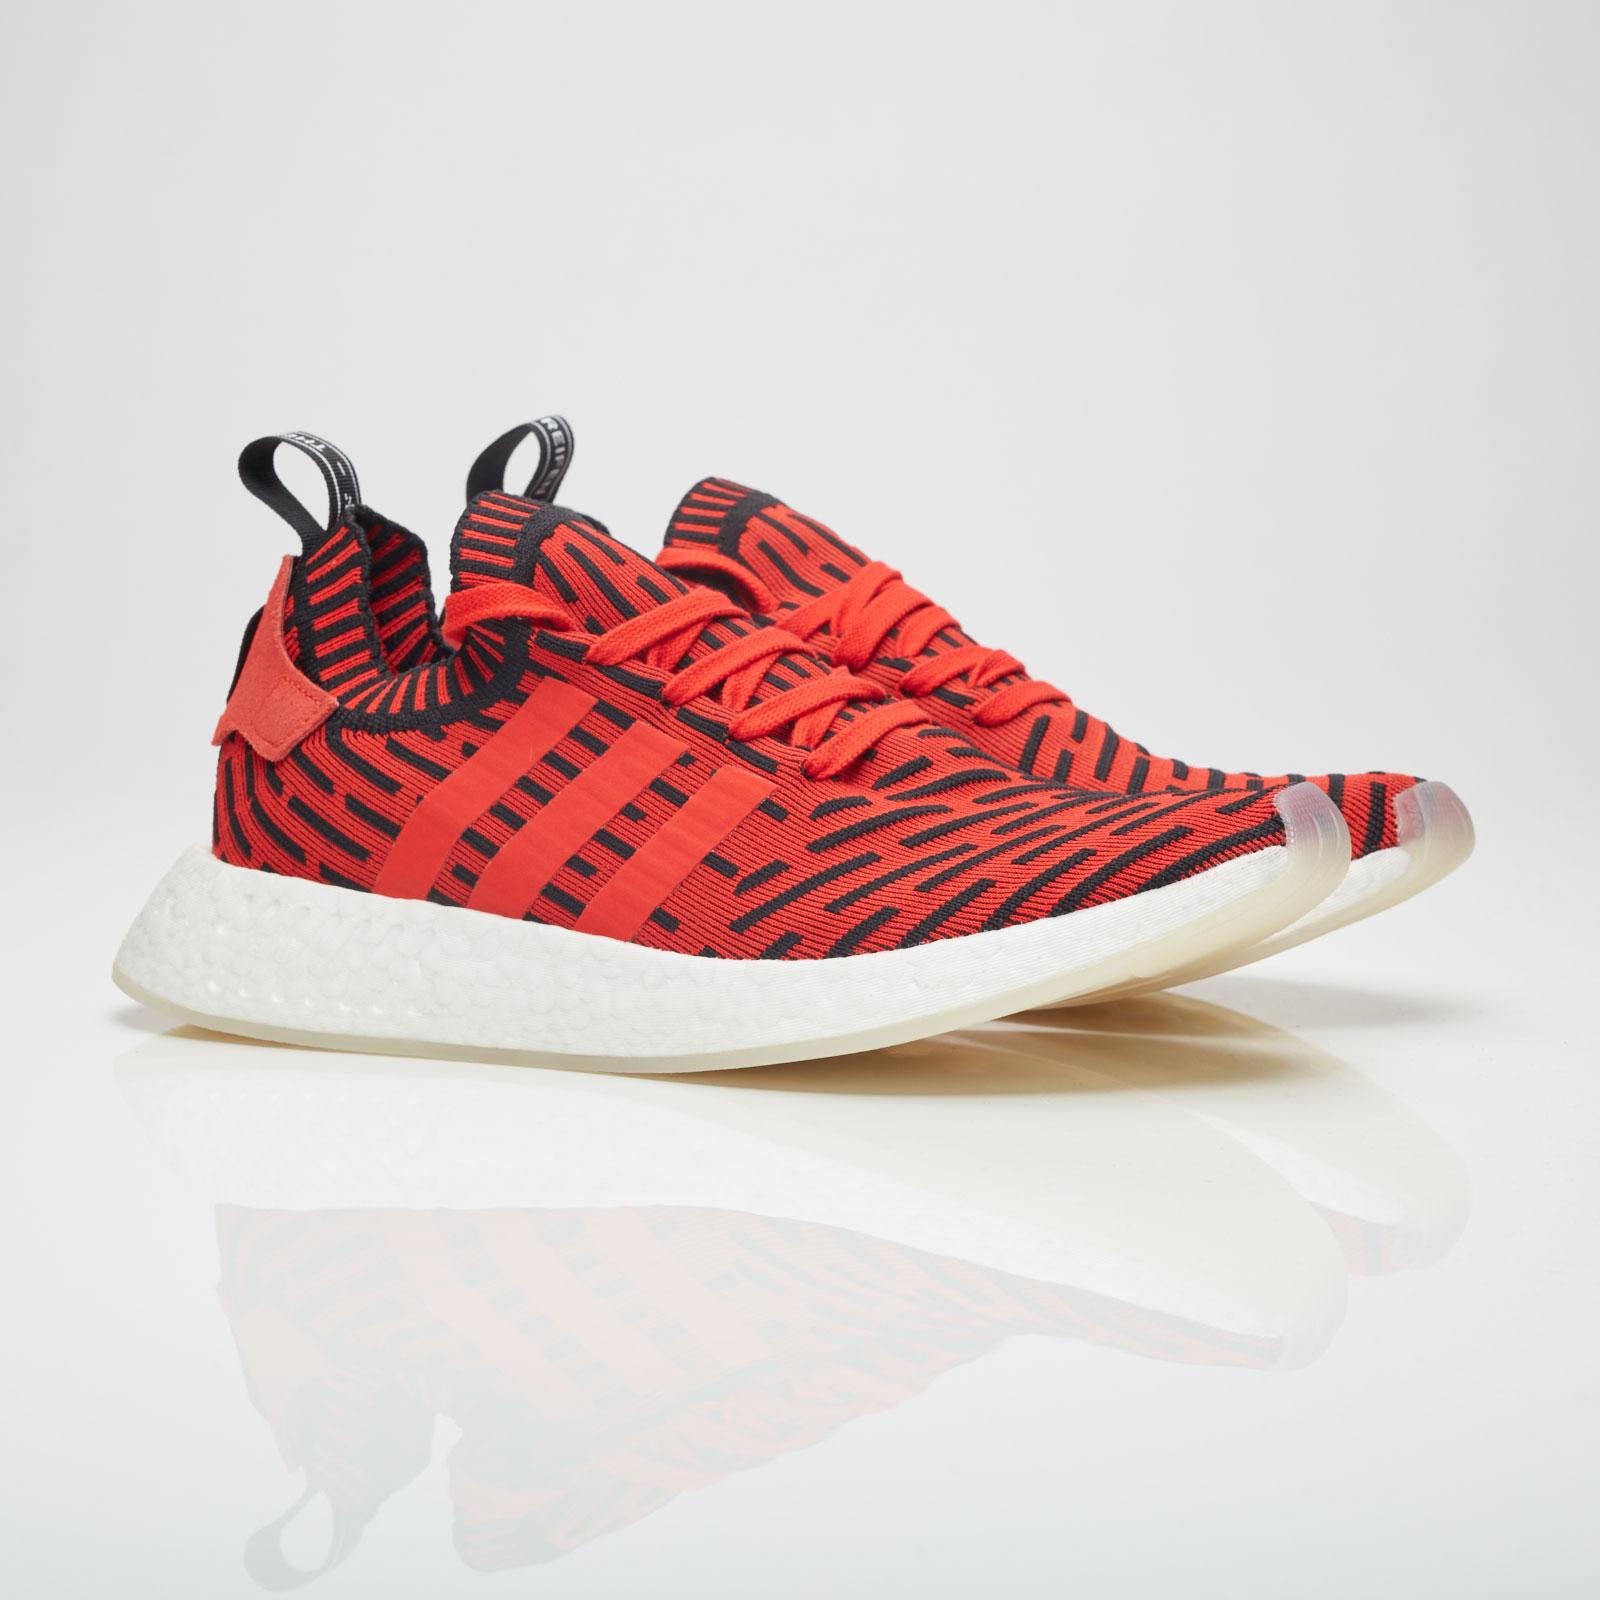 0d767081a adidas Nmd R2 Pk - Bb2910 - Sneakersnstuff